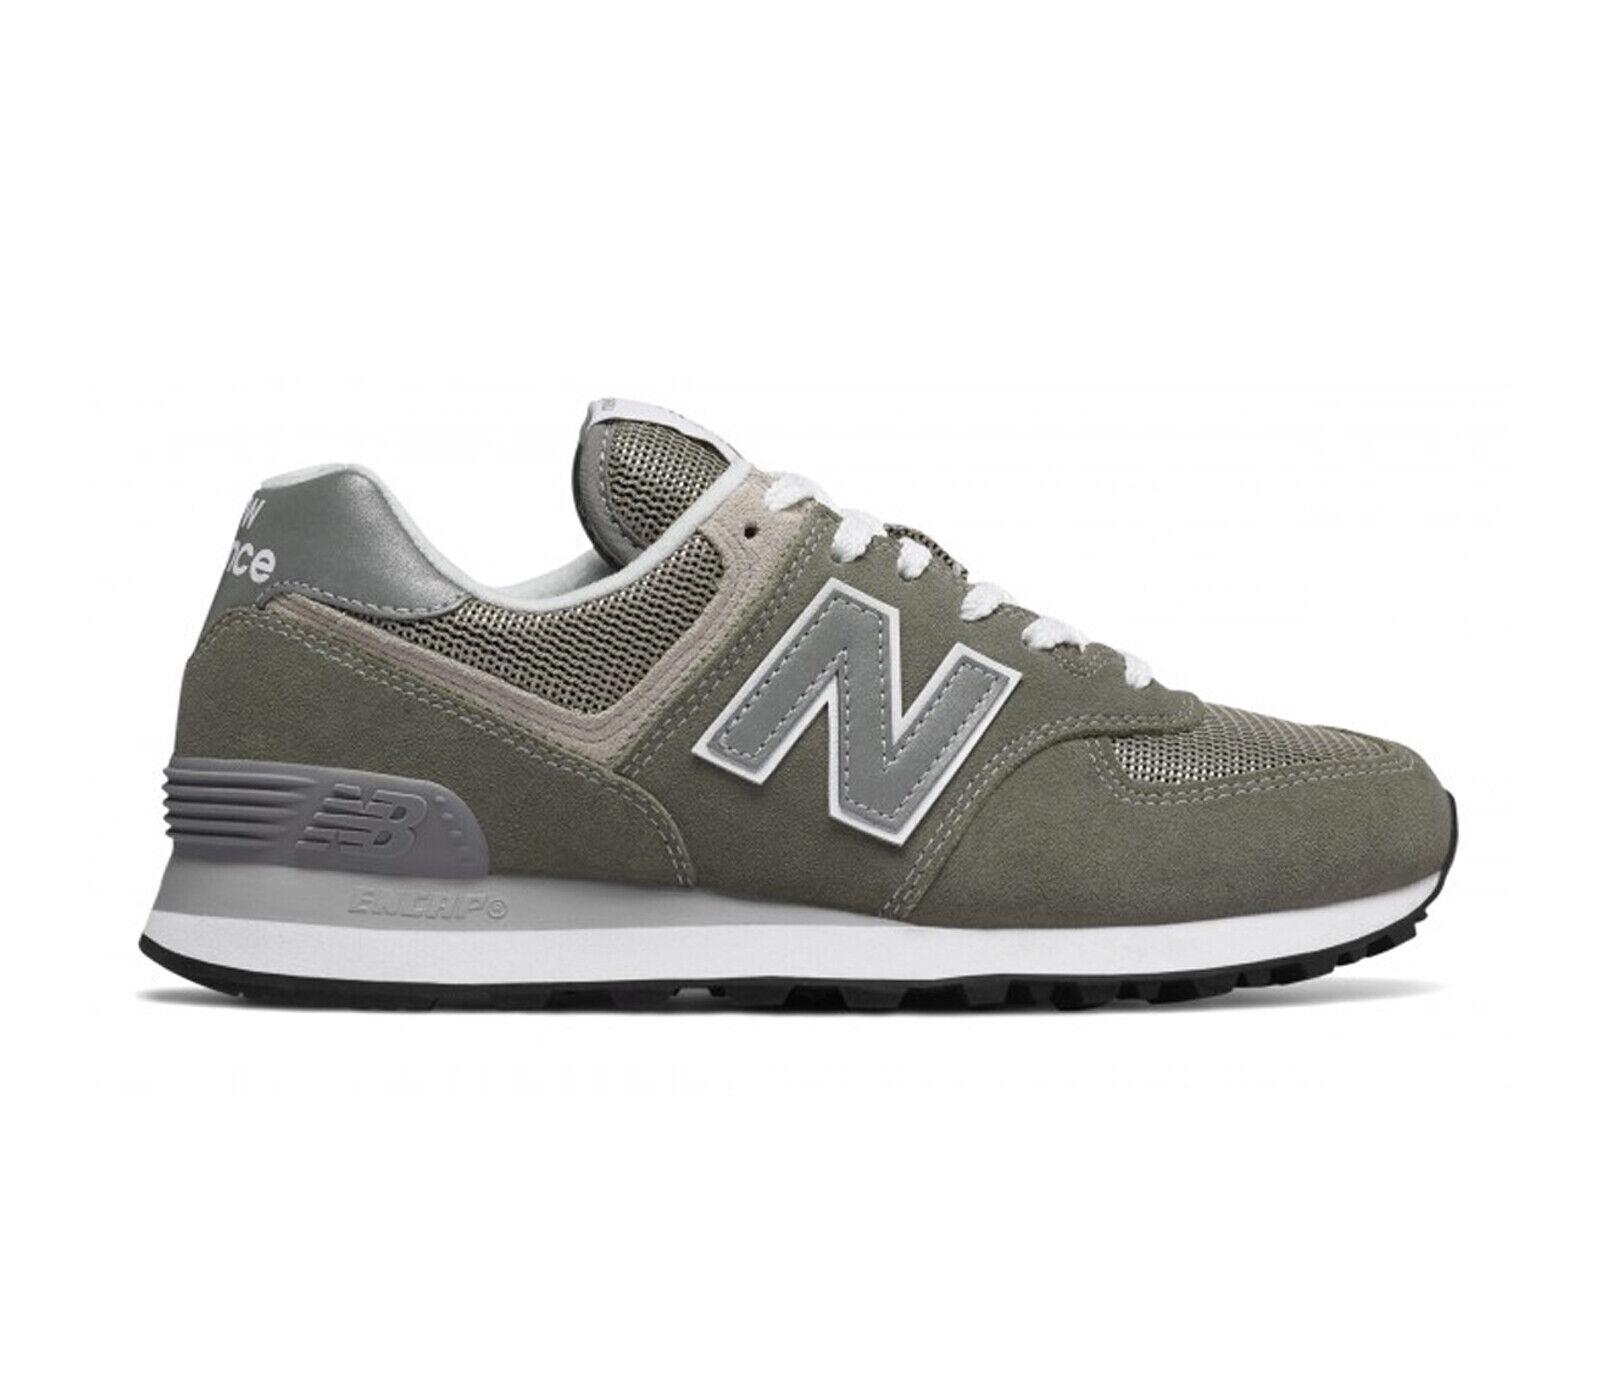 New Balance Women's 574 574 574 CORE CLASSIC shoes Grey WL574EG d 61dbde